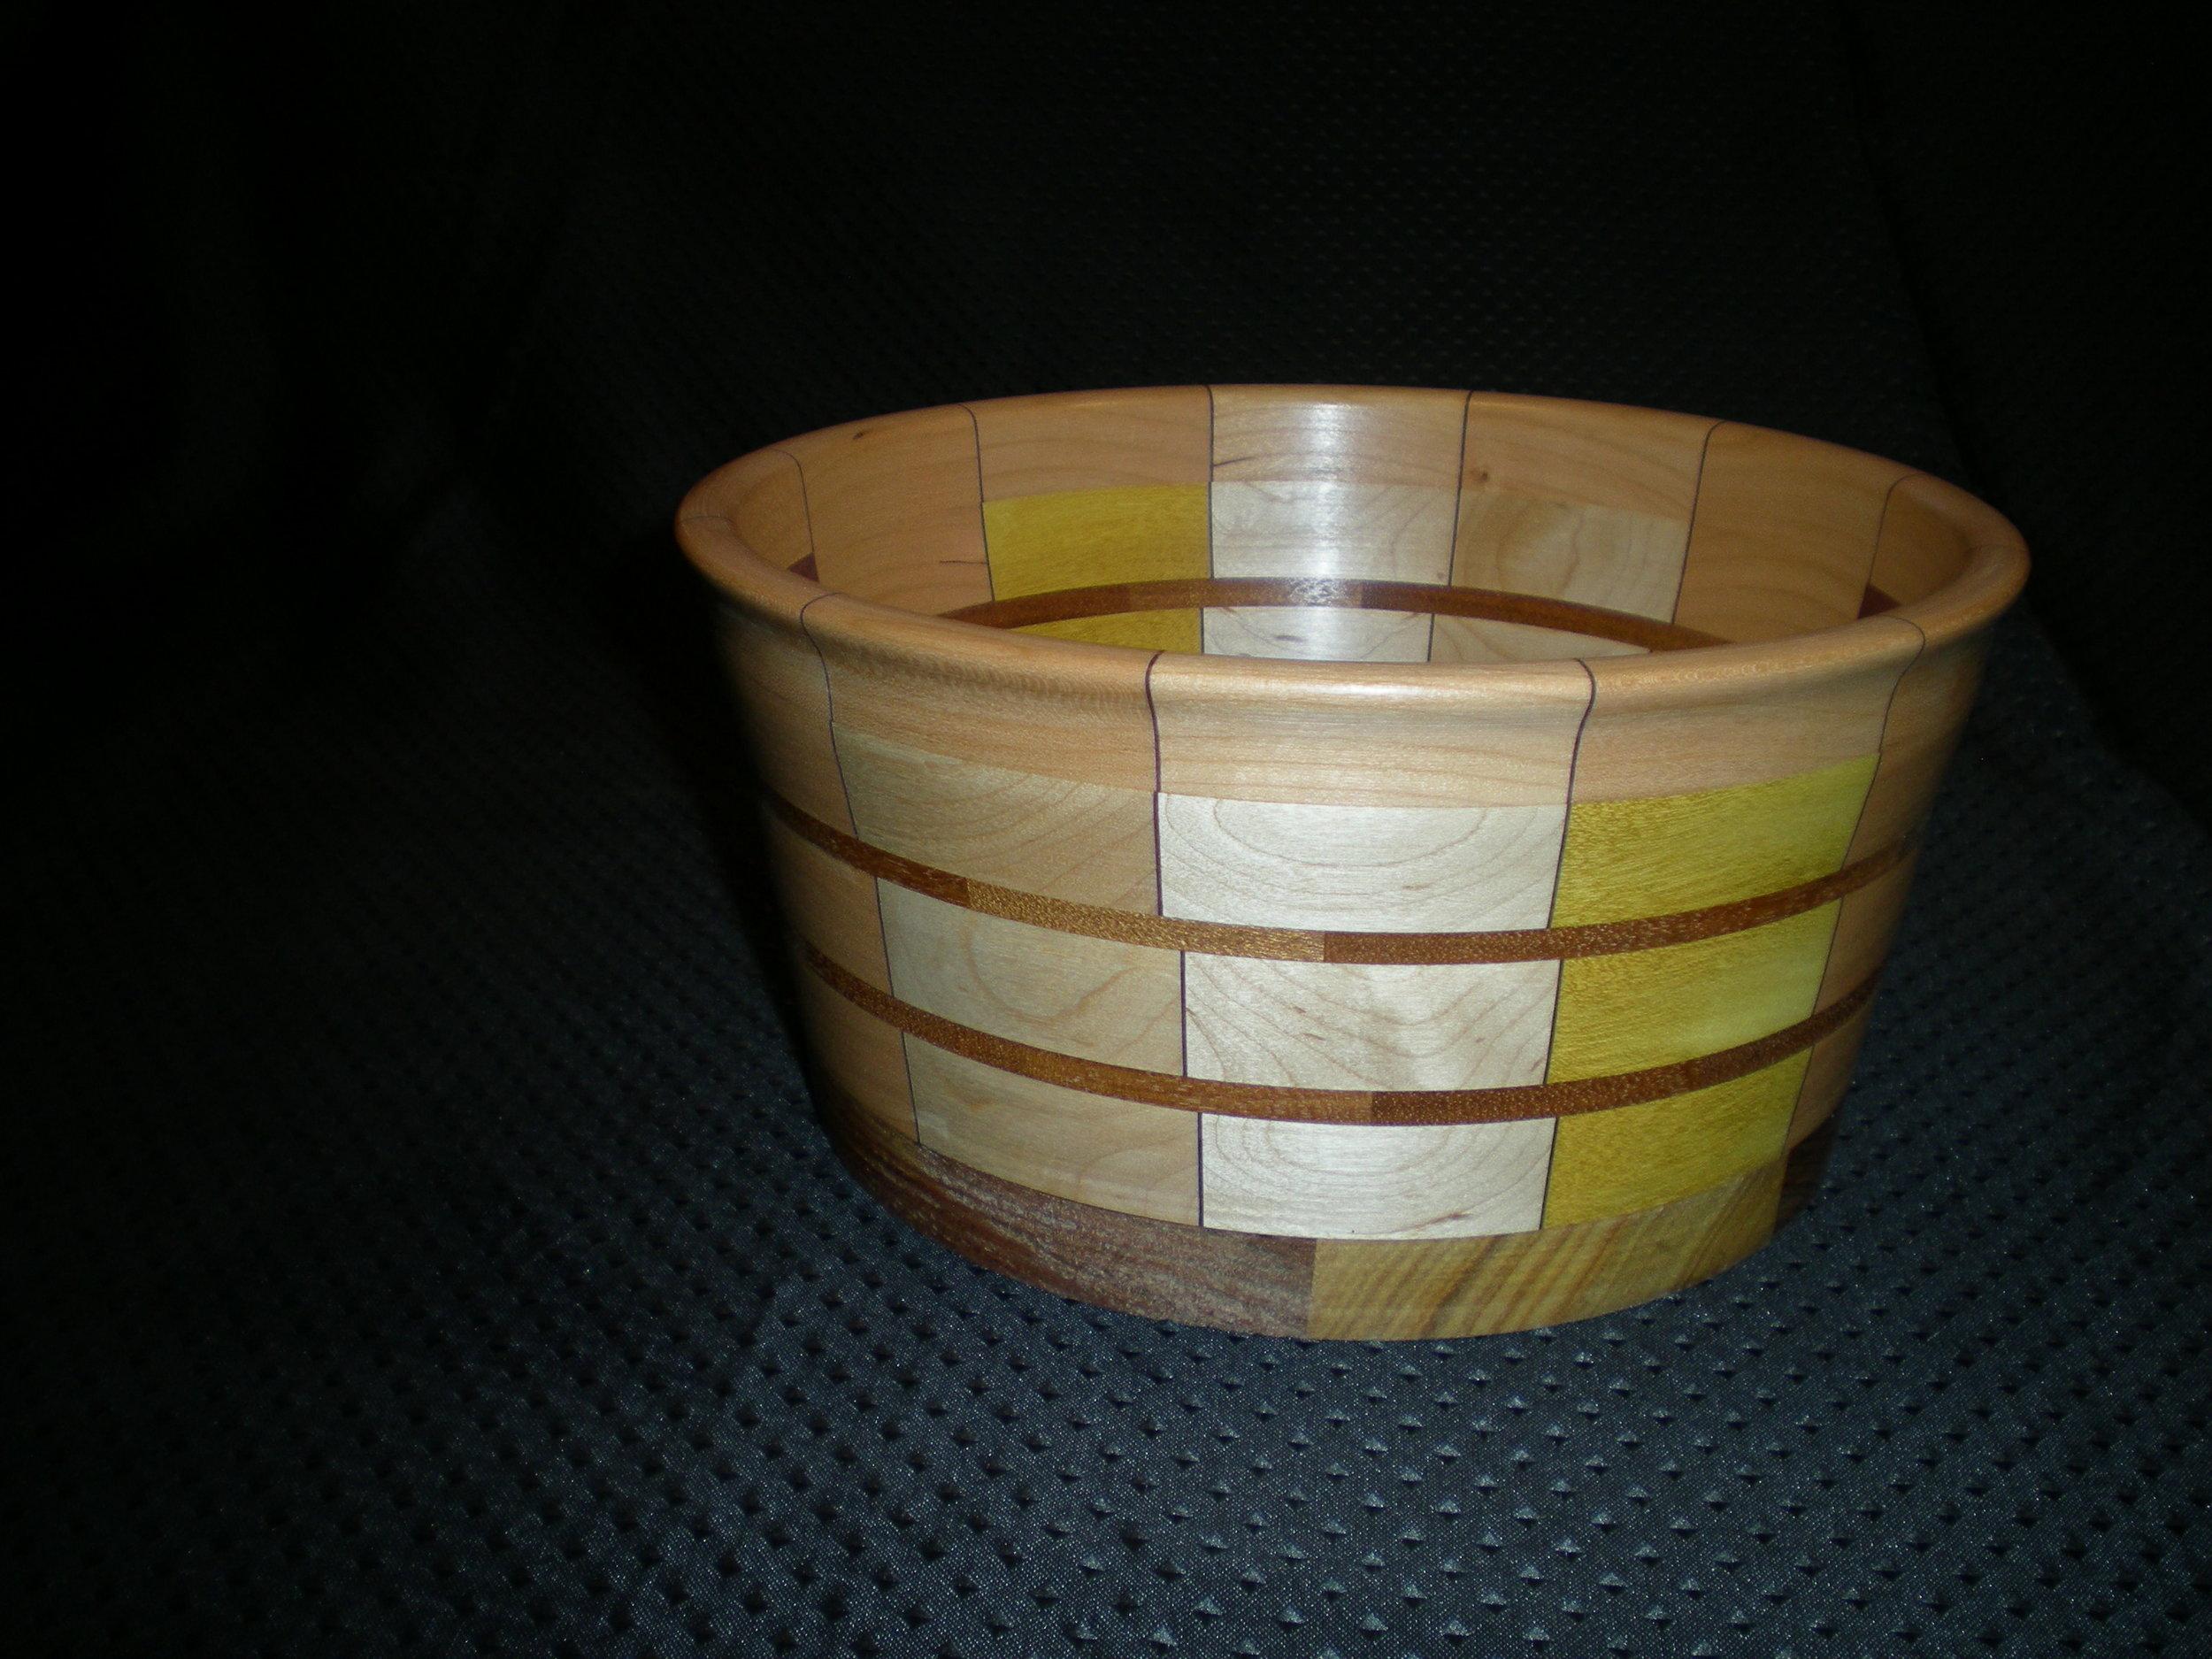 RJC Wood Creations - Bowls (21).JPG